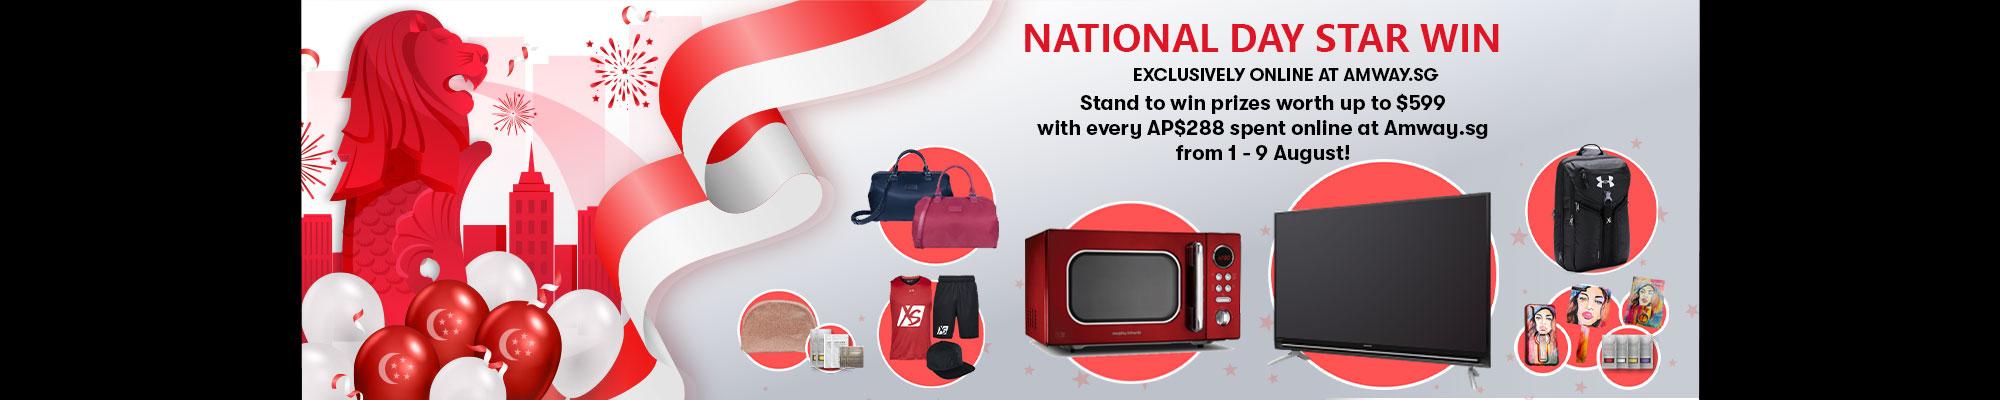 National-Day-Star-Win.jpg